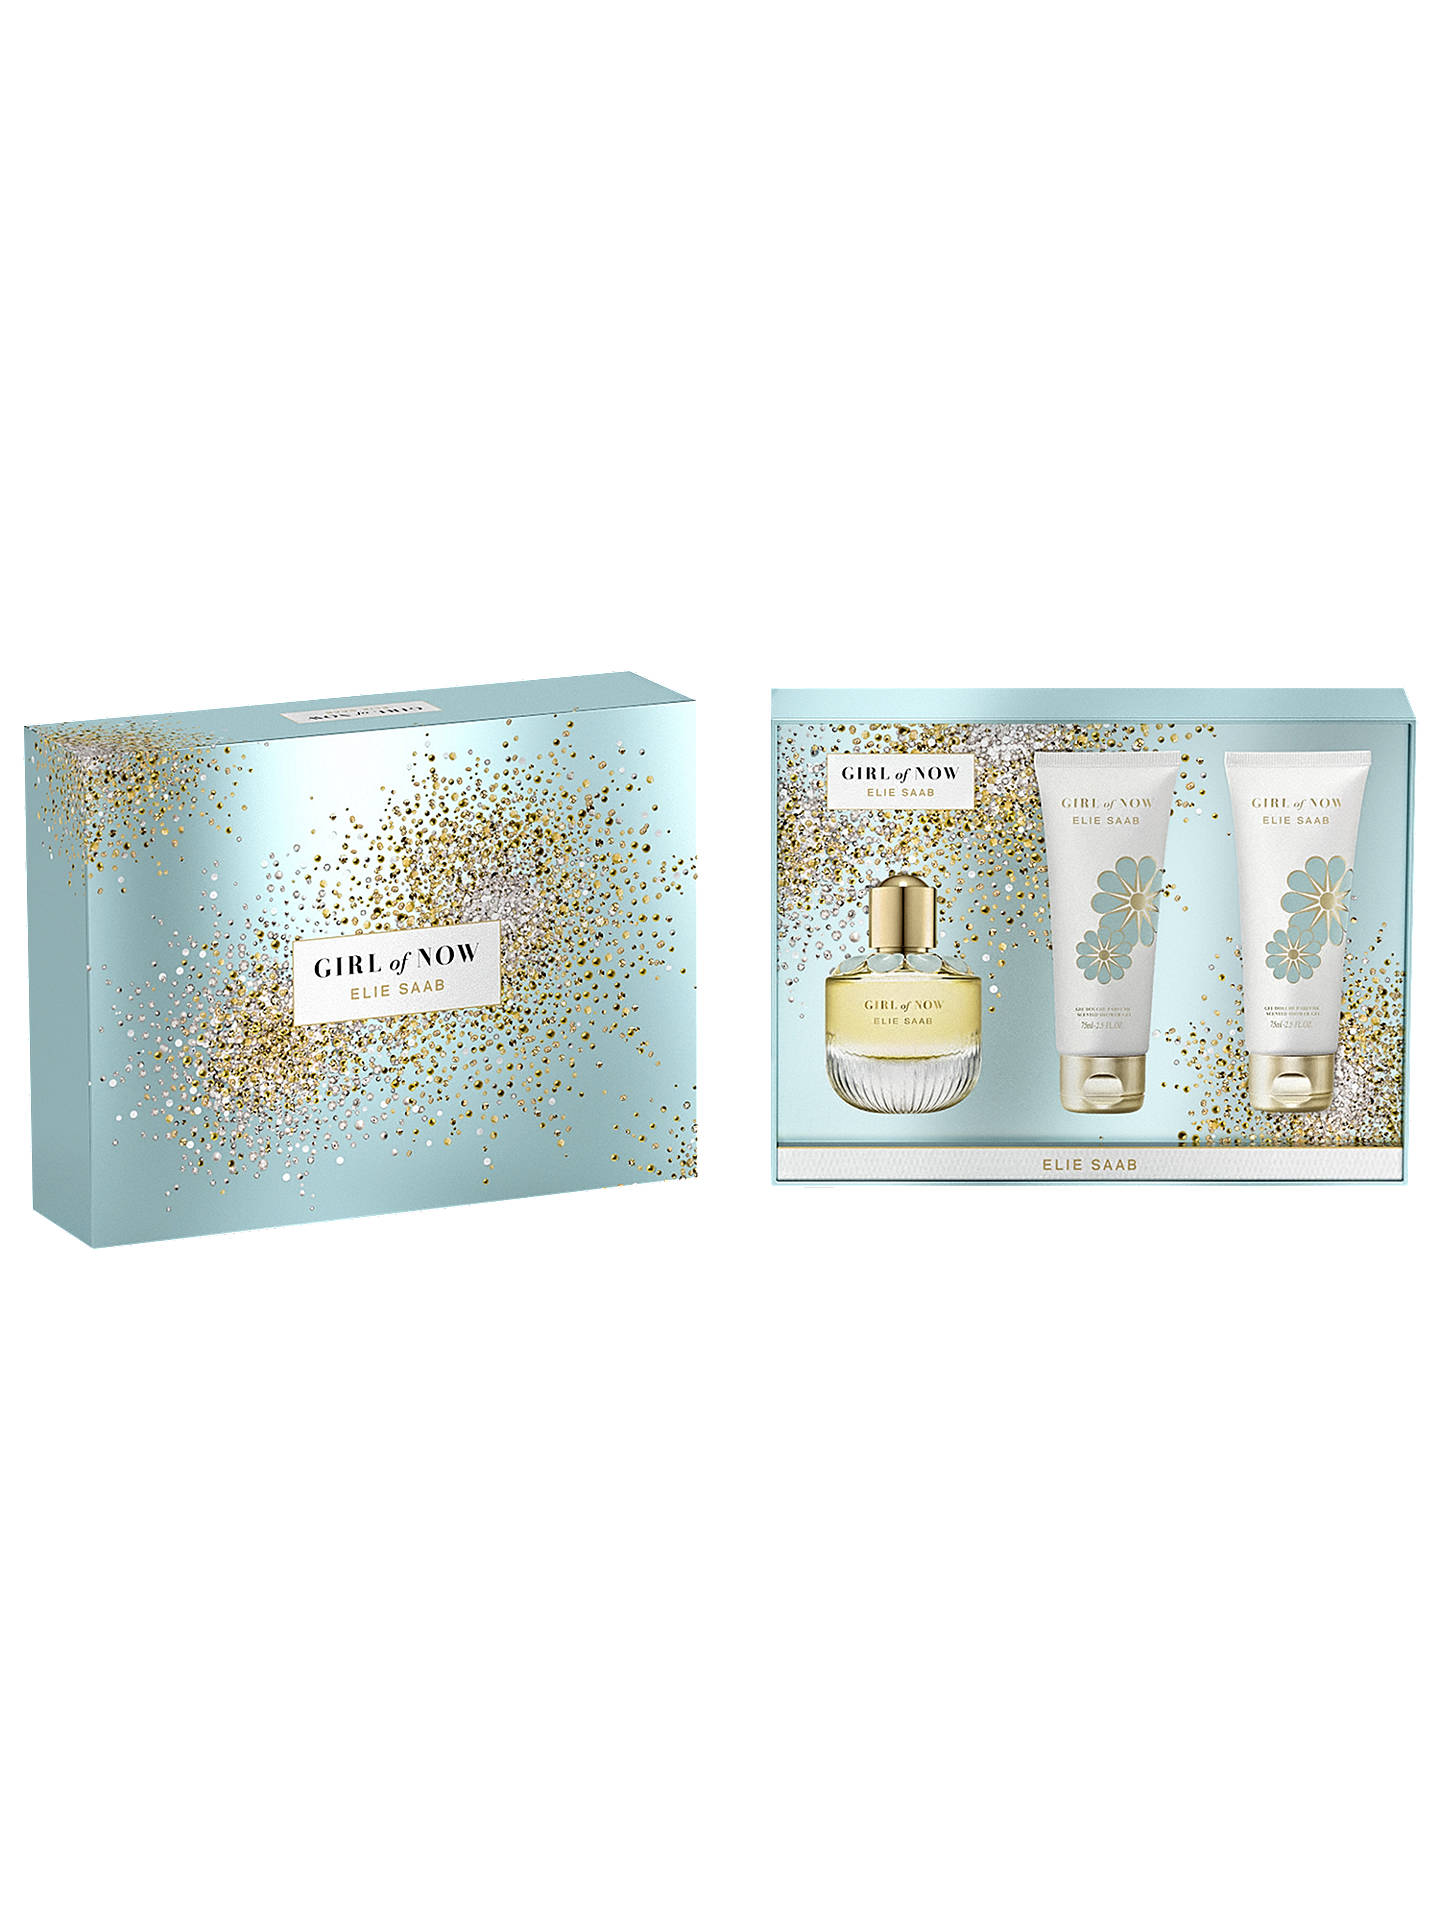 BuyElie Saab Girl of Now 50ml Eau de Parfum Gift Set Online at johnlewis.com 2c36130d5